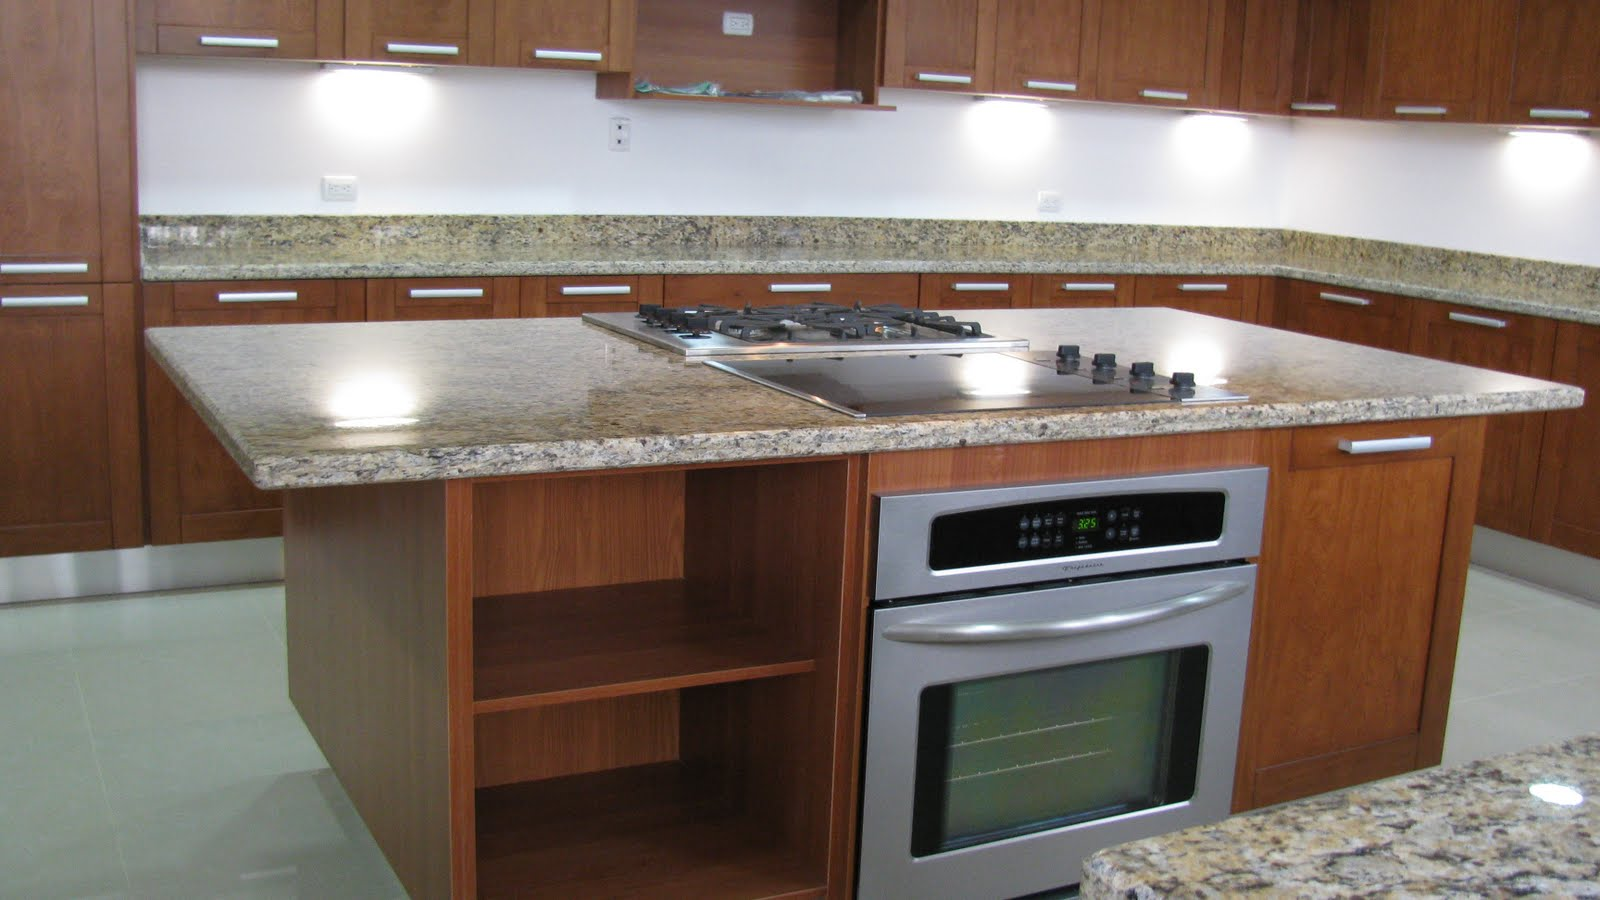 Accesorios muebles cocina costa rica - Muebles accesorios cocina ...